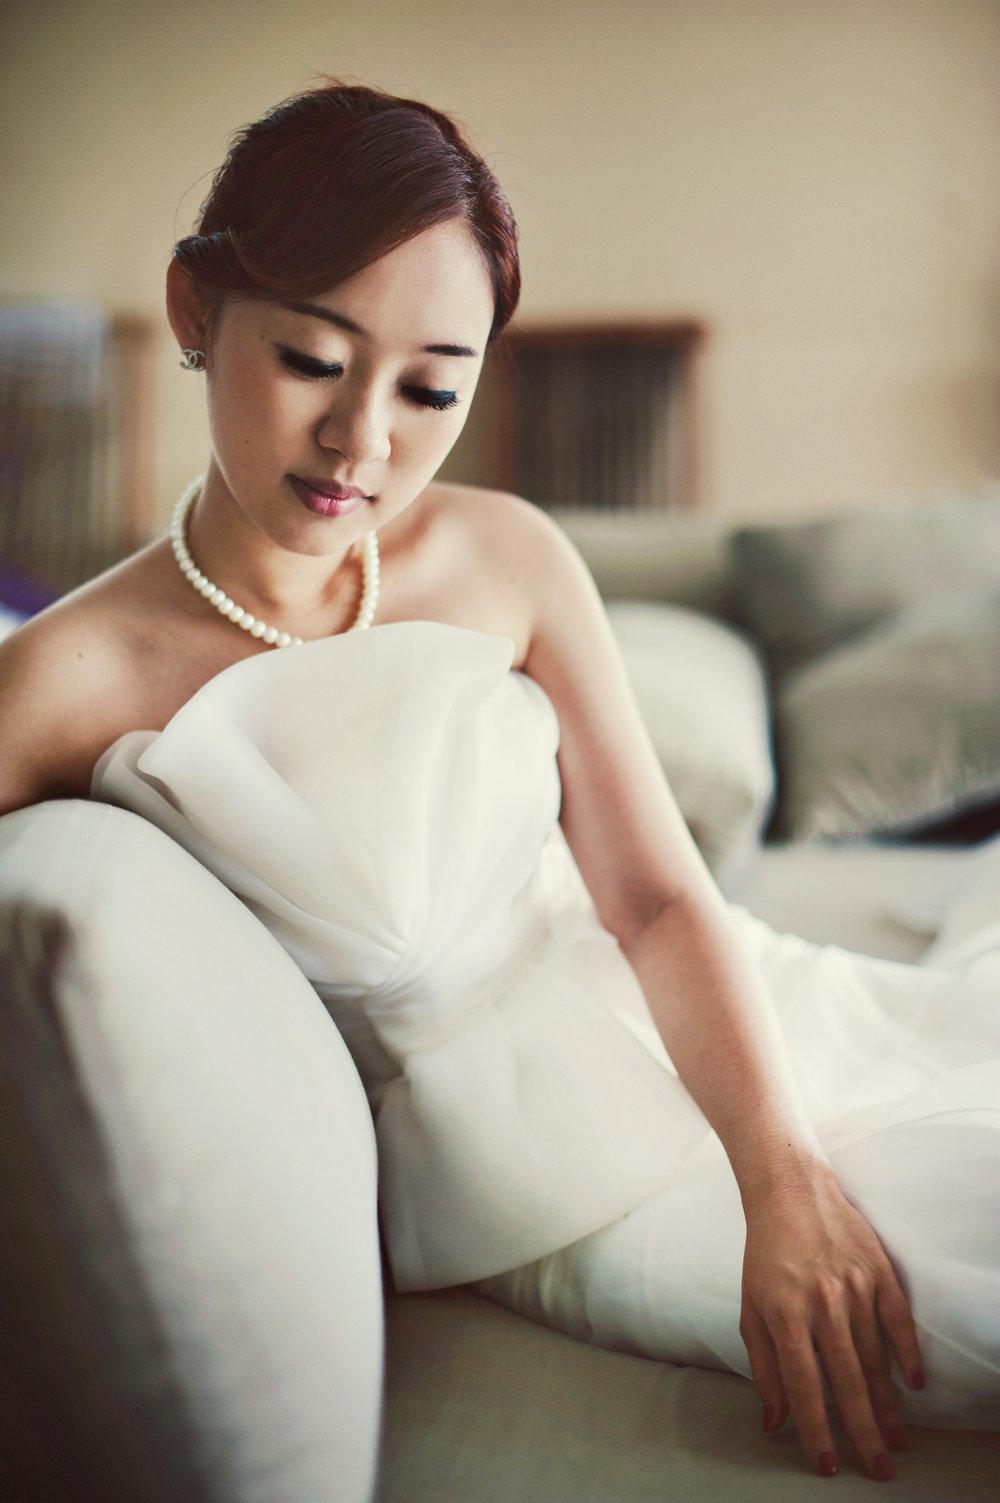 Chris_Hui_婚禮_婚紗照_pre_wedding_photography_best_059_.jpg